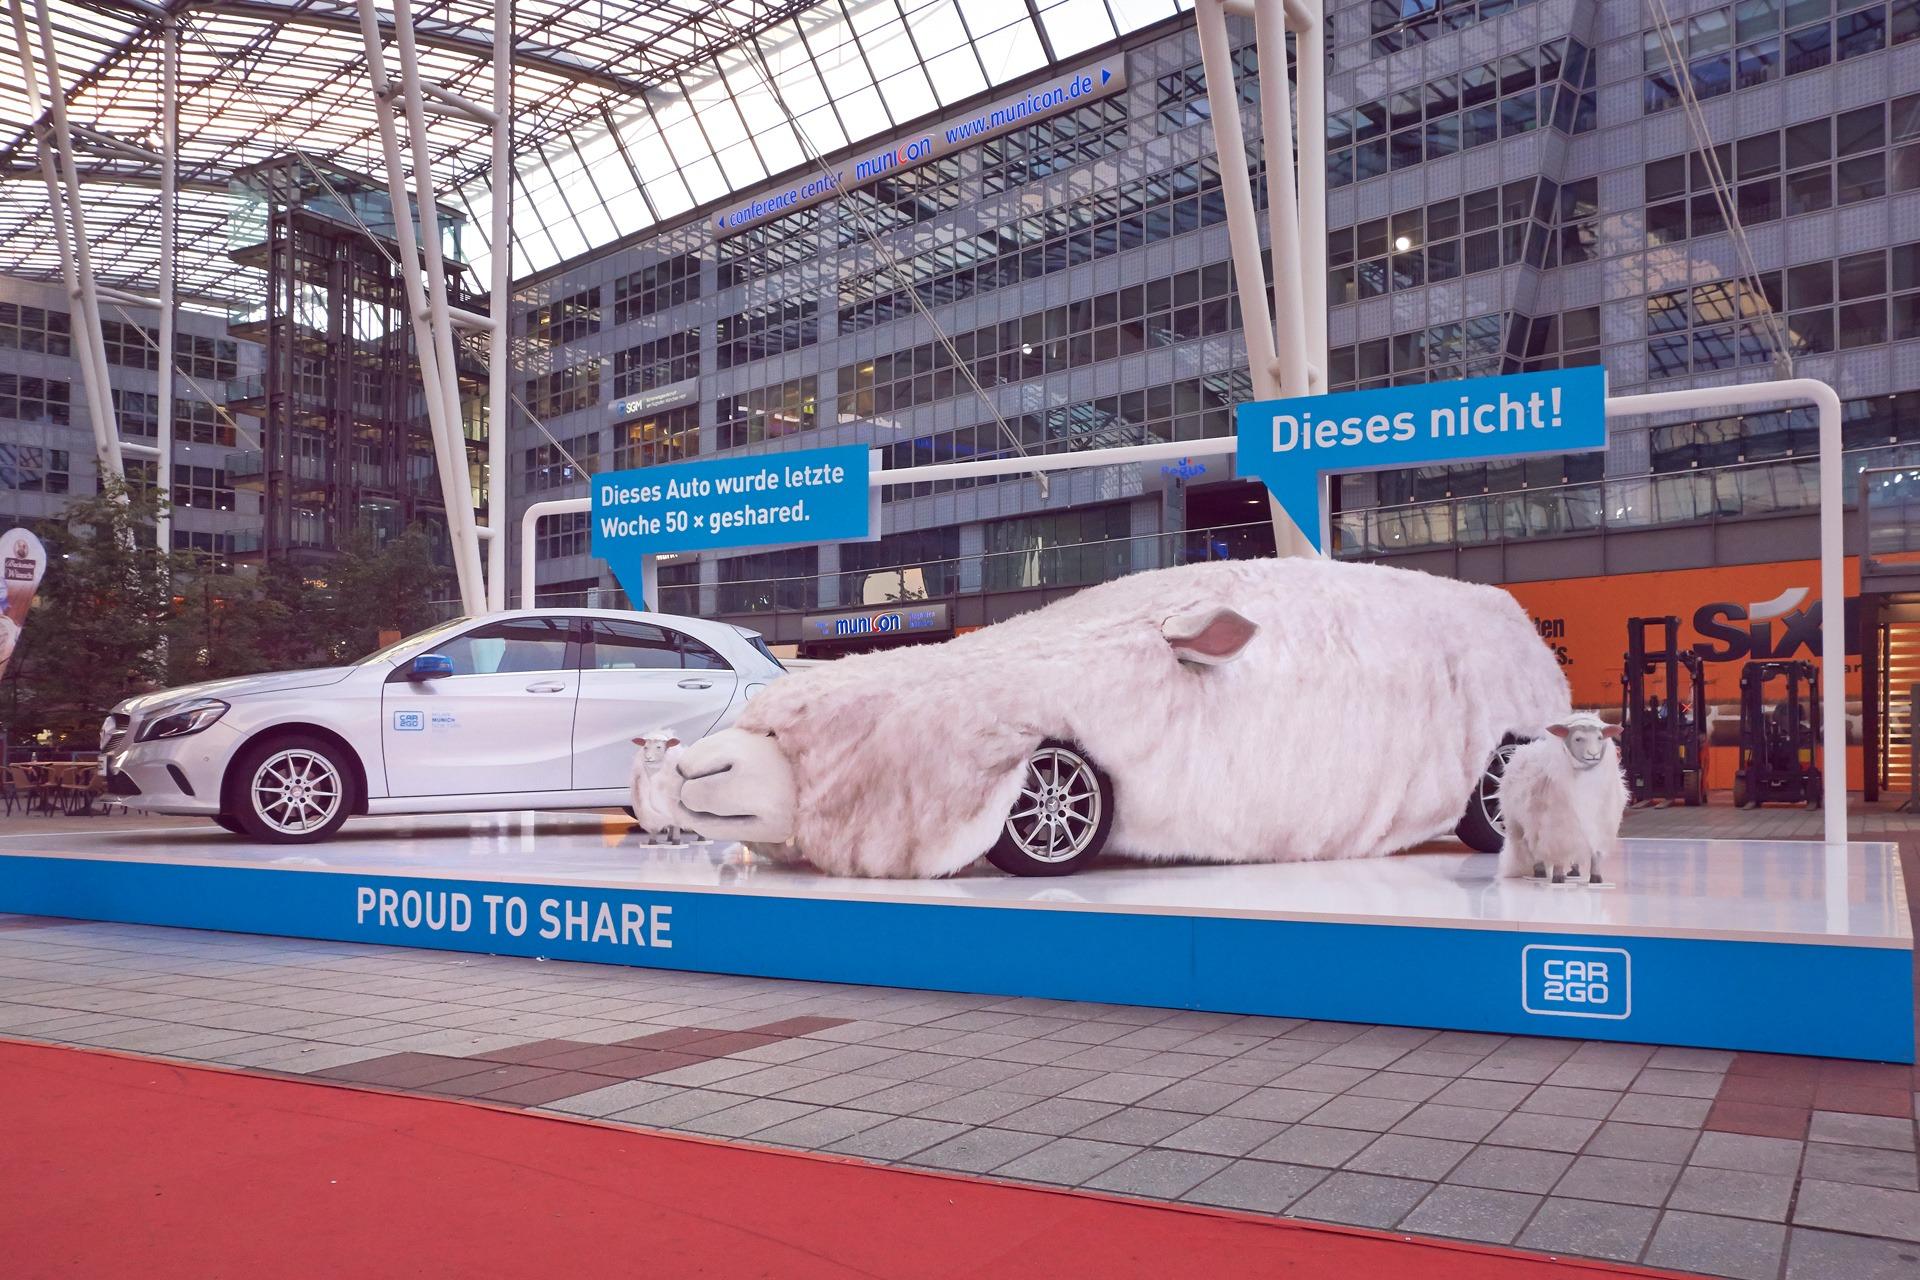 Car2Go Flughafenpromotion